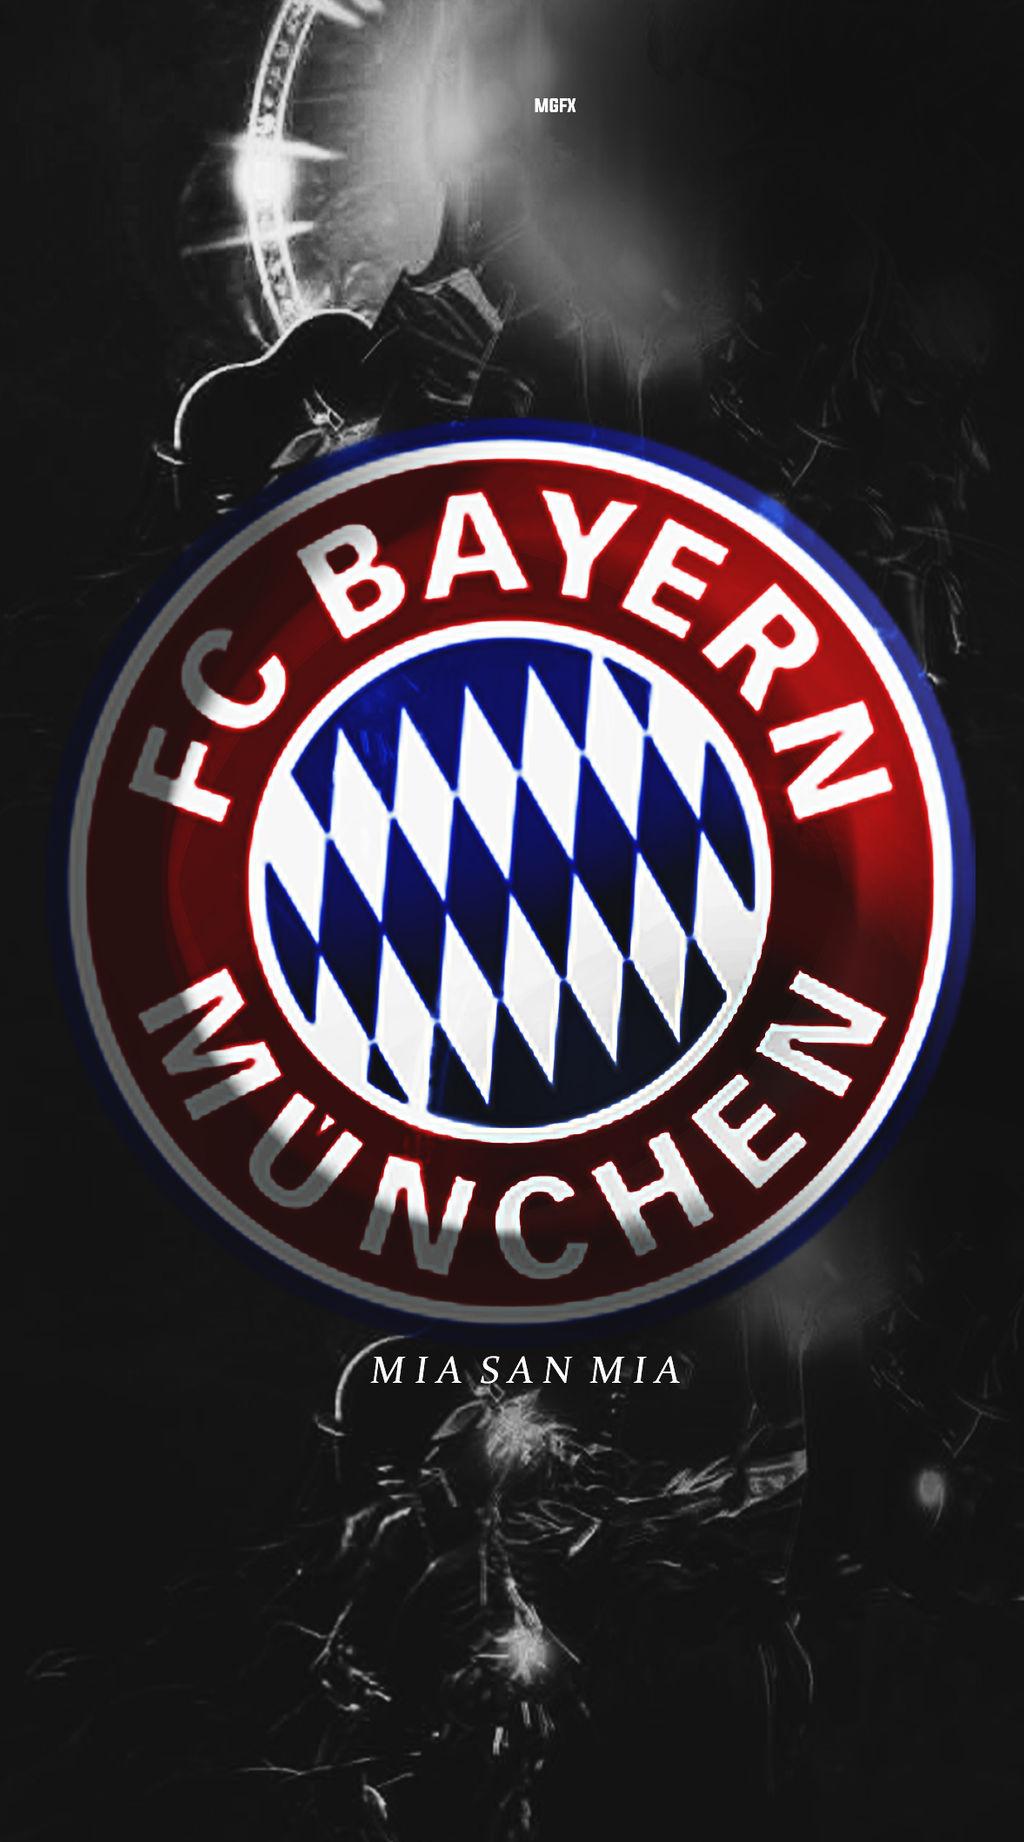 FC BAYERN MUNCHEN WALLPAPER LOCK SCREEN 2018|17 by ...